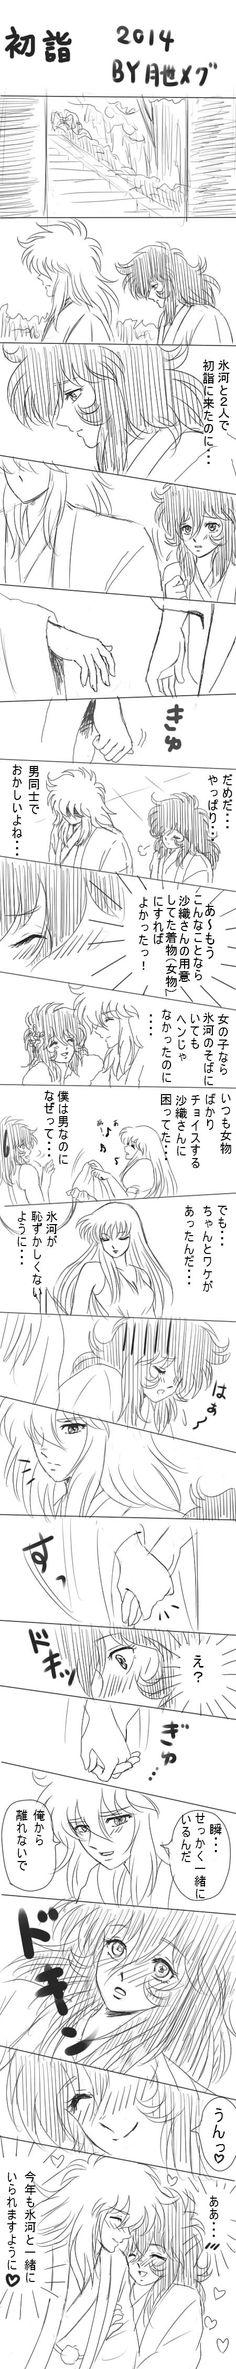 「A Happy New Year!!」/「月世メグ」の漫画 [pixiv]